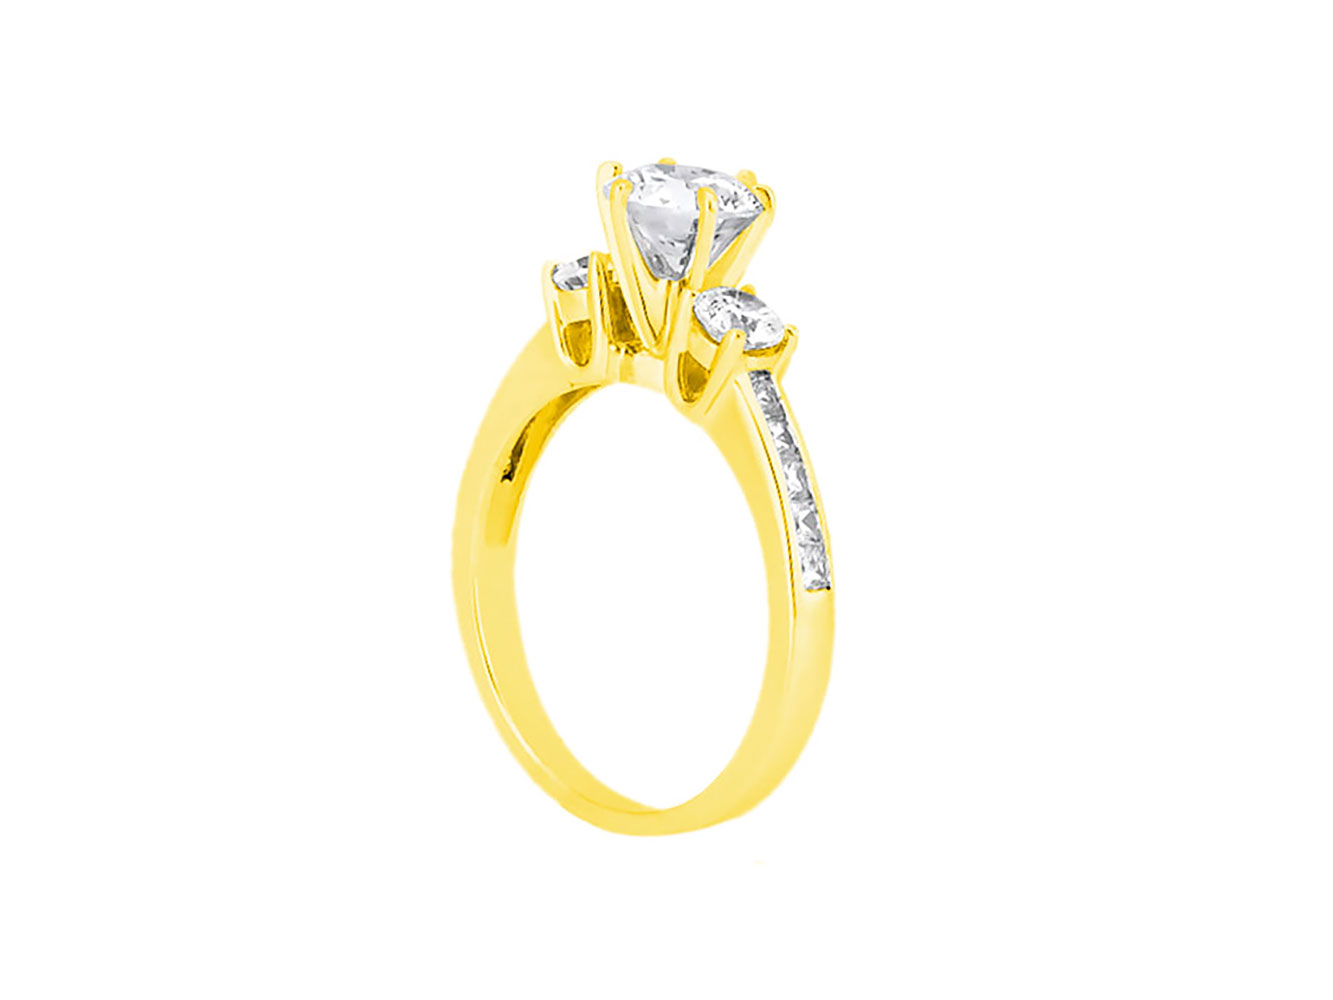 1-10-Quilates-Redondo-Princesa-Anillo-de-Compromiso-Diamante-Corte-10-Oro-Kl-I1 miniatura 11